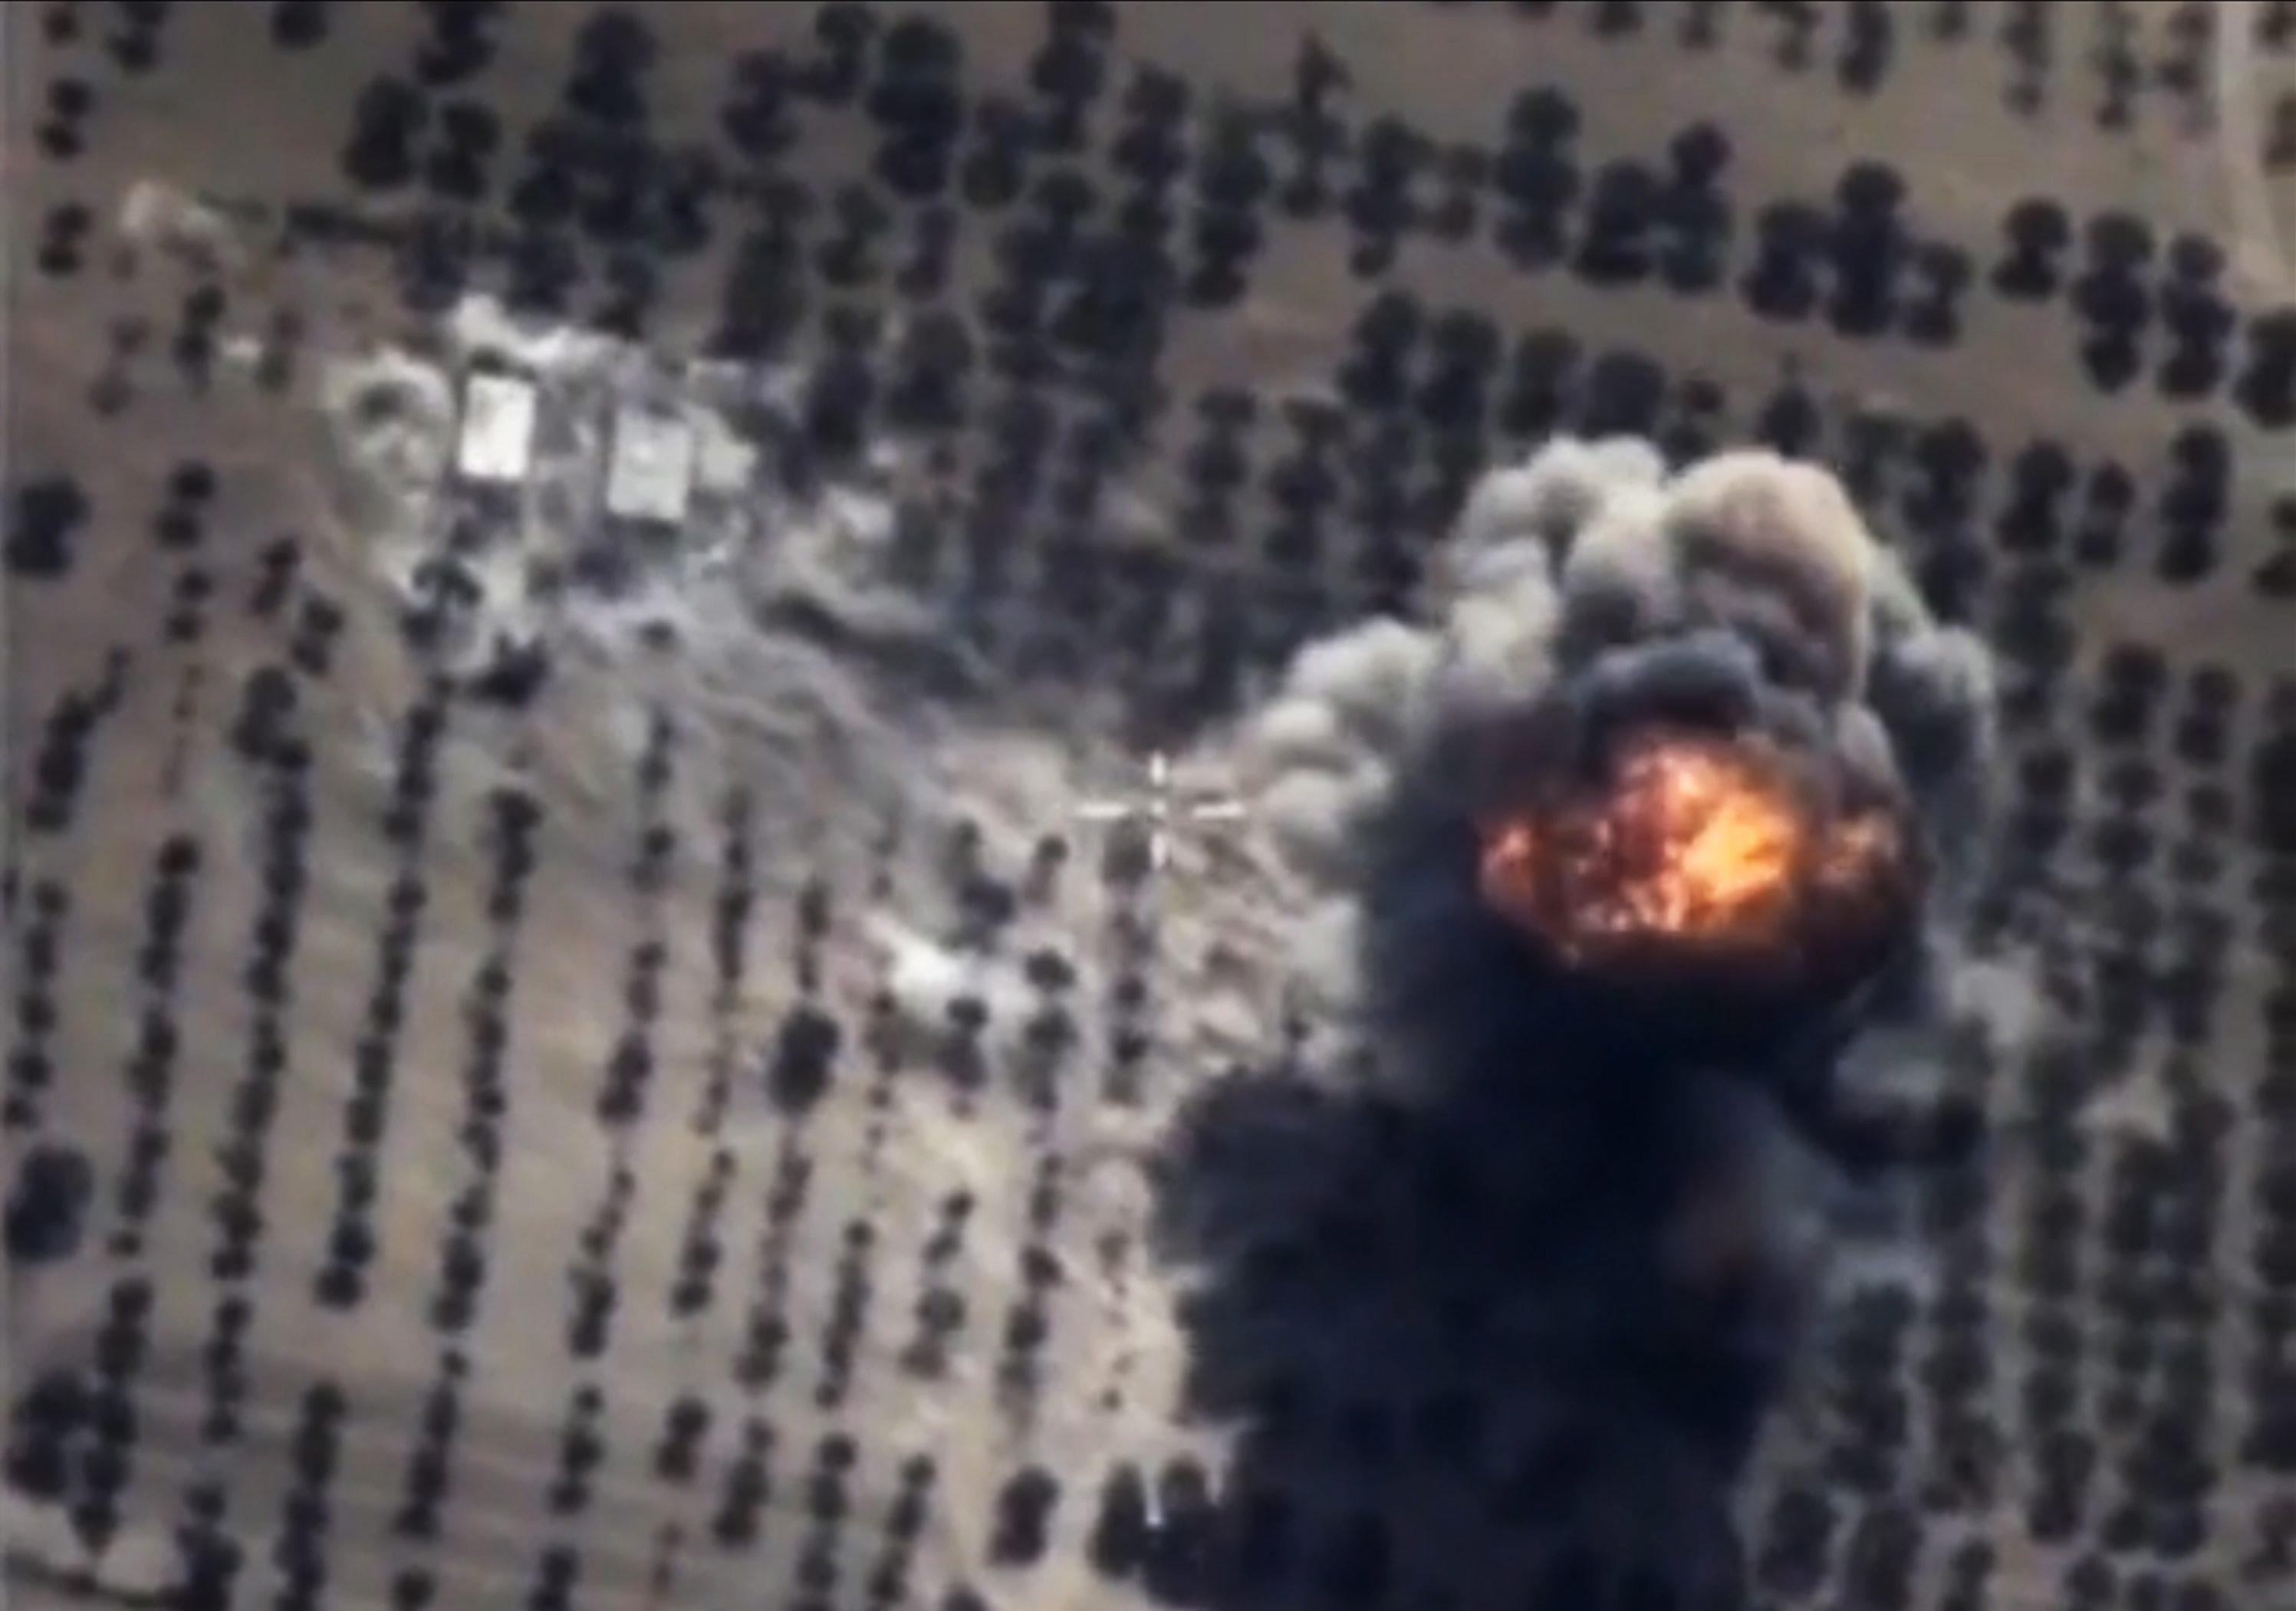 Rusia a lansat raiduri aeriene asupra unor tinte ISIS din Siria. Atentat cu masina-capcana intr-o tabara de refugiati